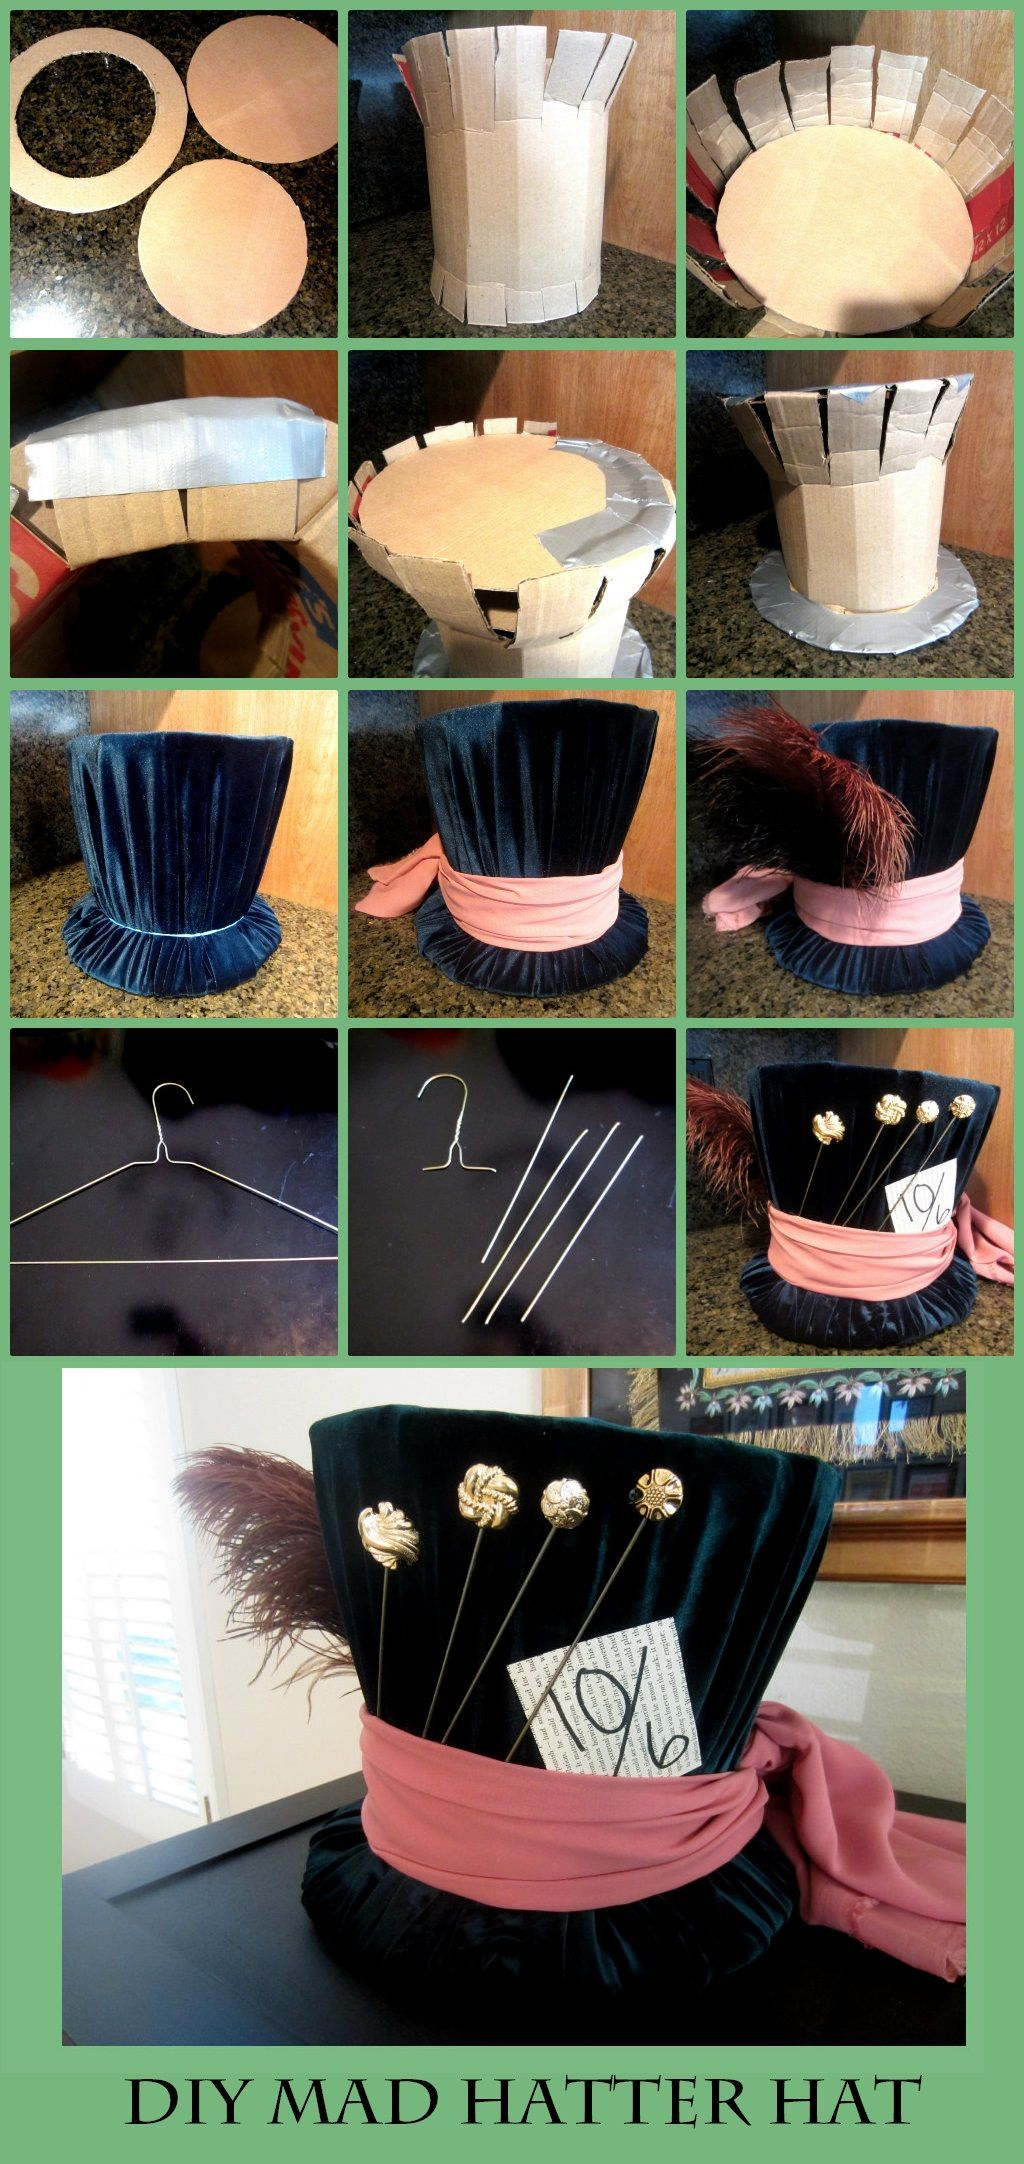 , DIY Mad Hatter Top Hat – DIY Inspired, My Travels Blog 2020, My Travels Blog 2020